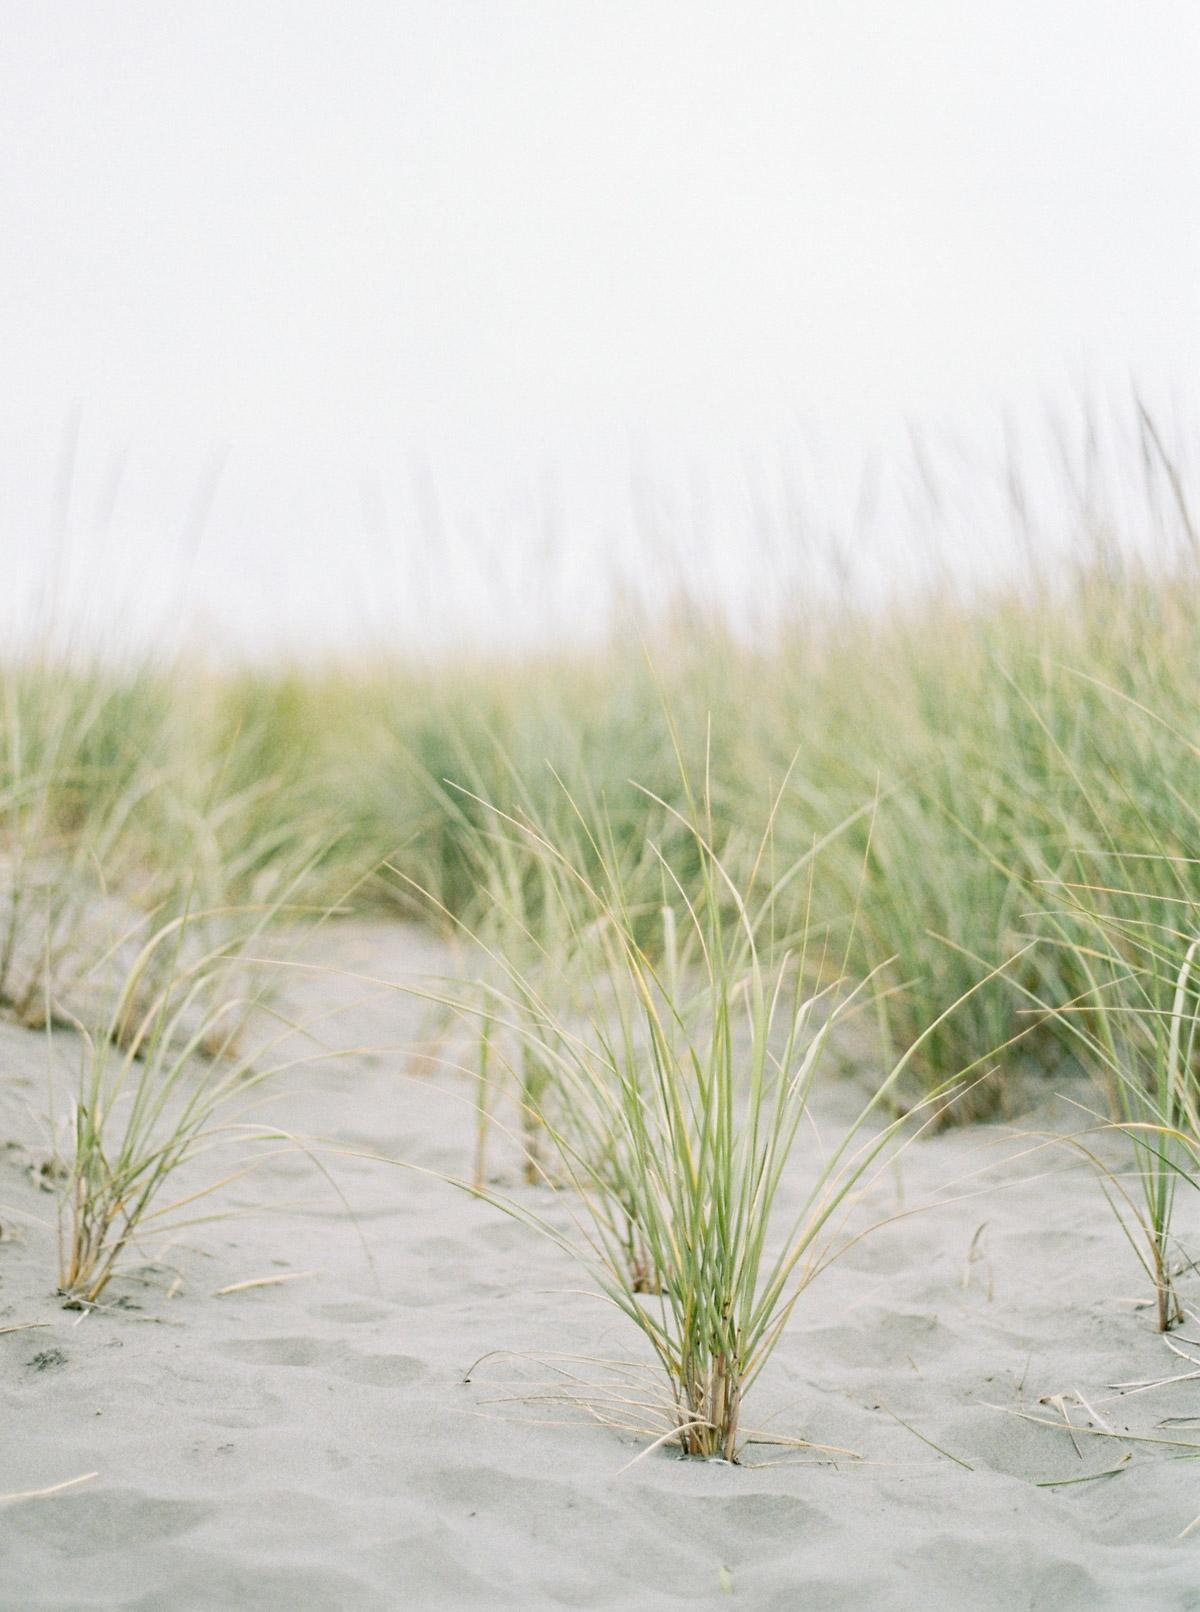 Photograph of Sea grass on a washington coast beach